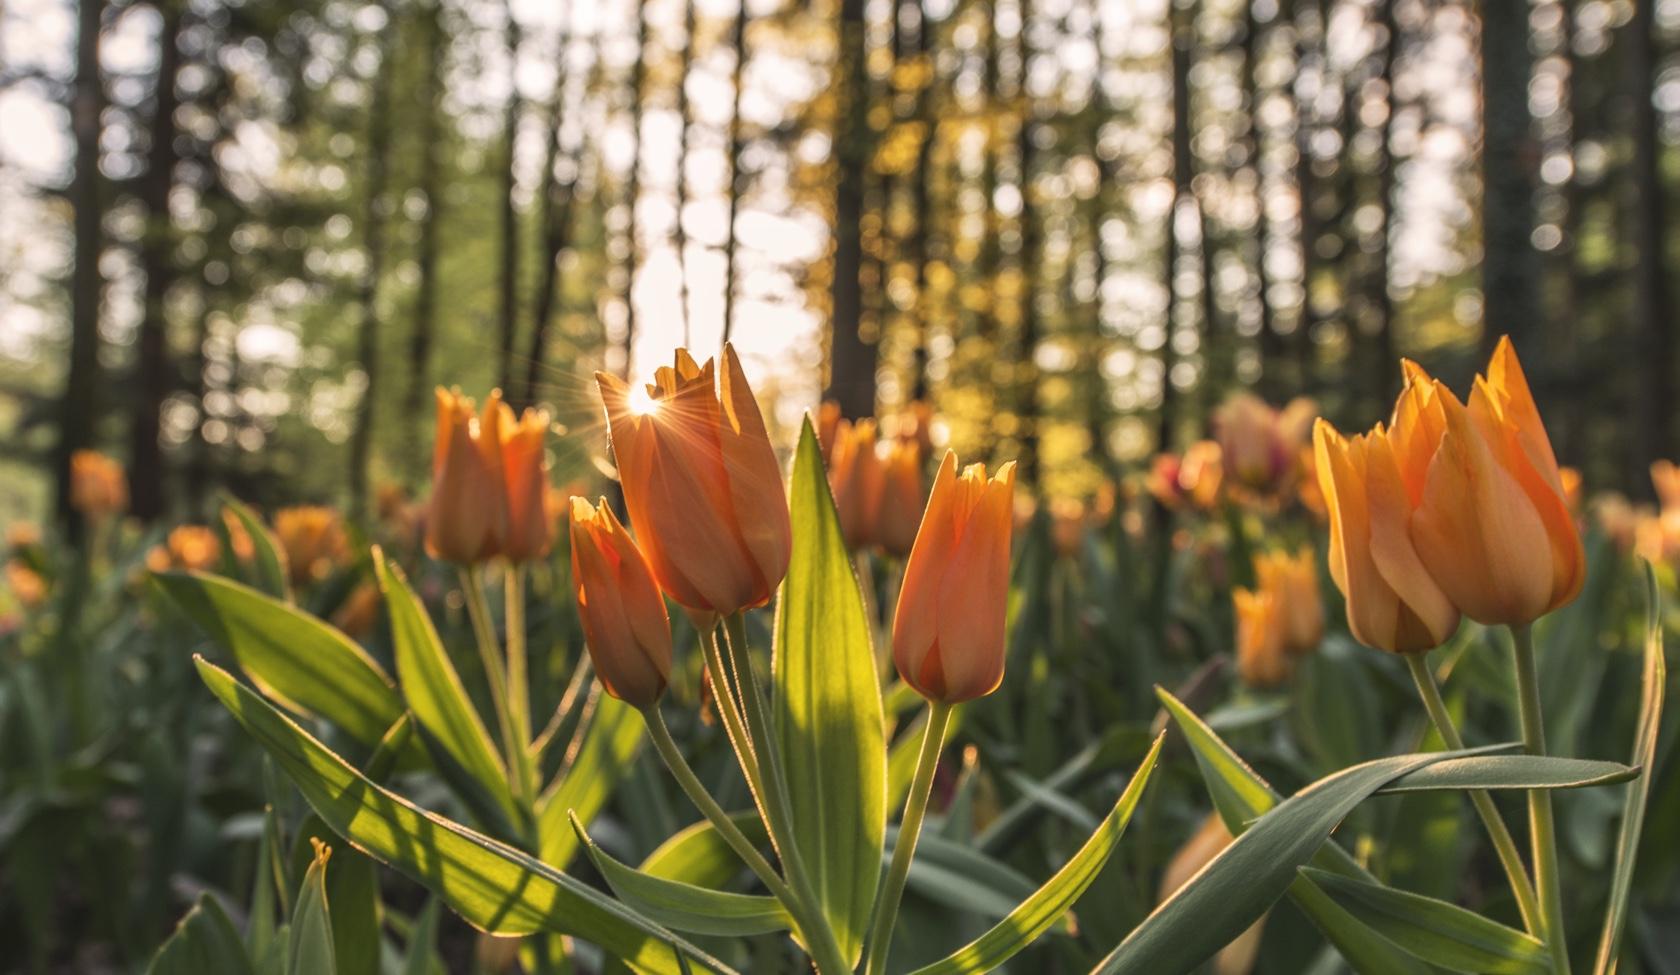 Sun & Tulips